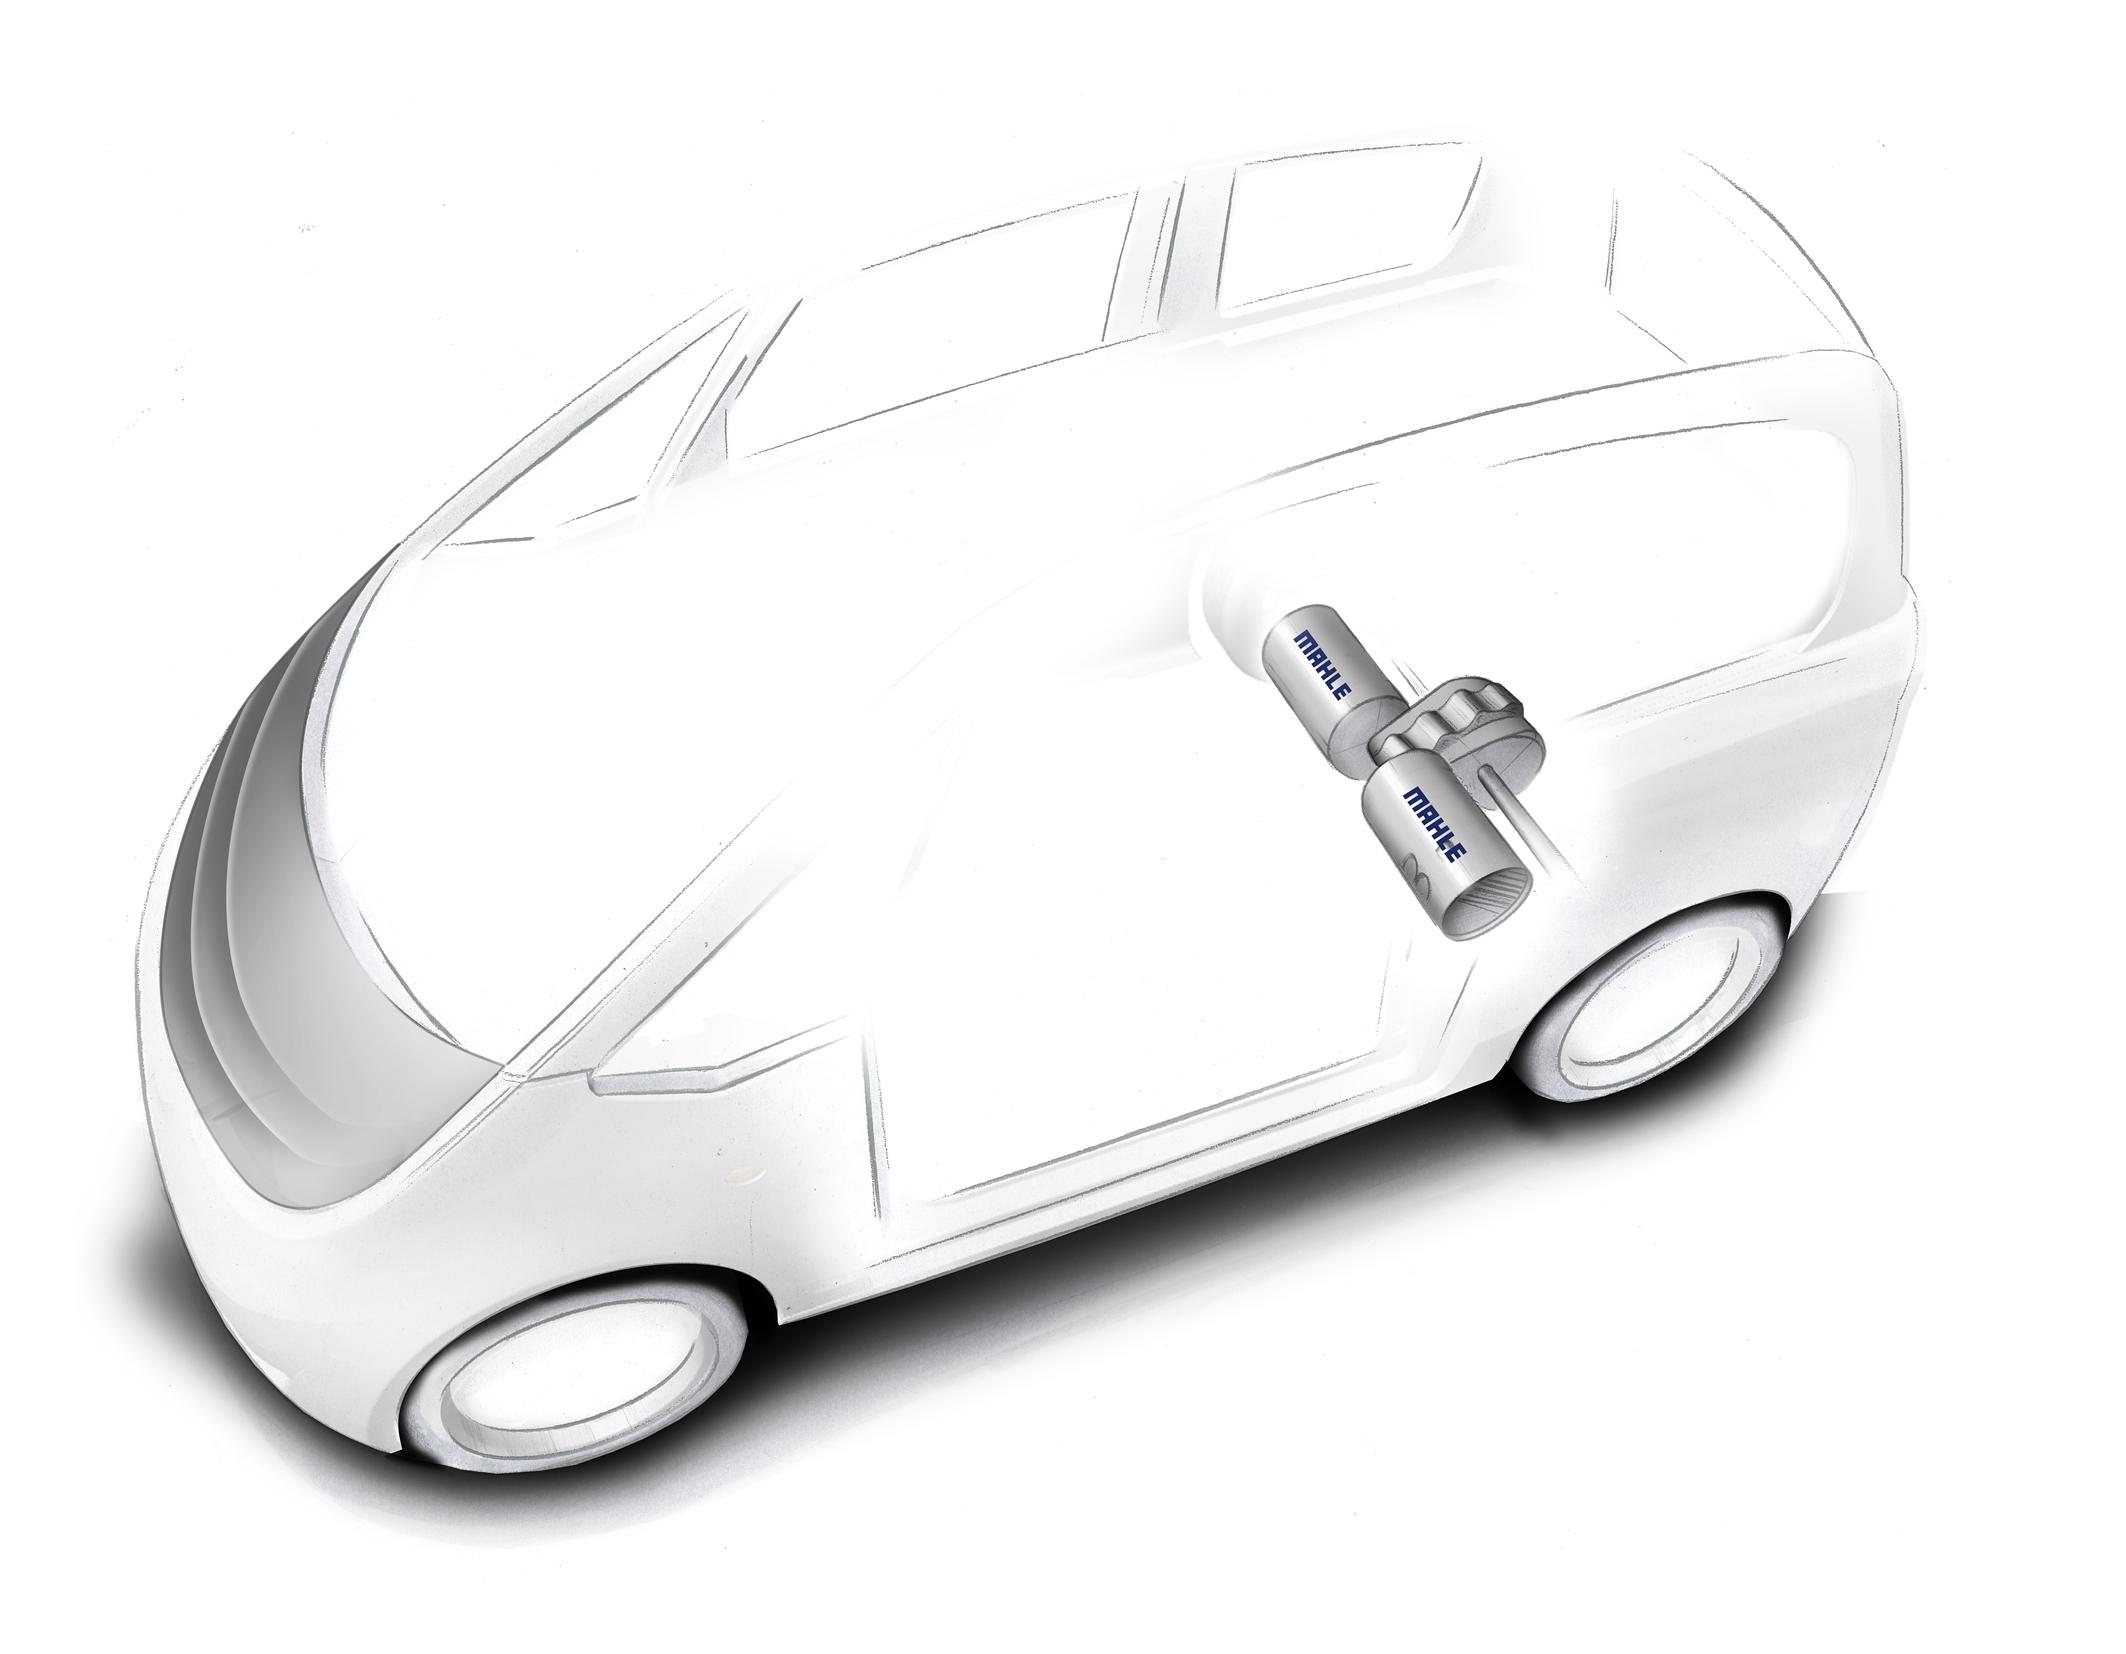 MAHLE Efficient Electric Transport (MEET)